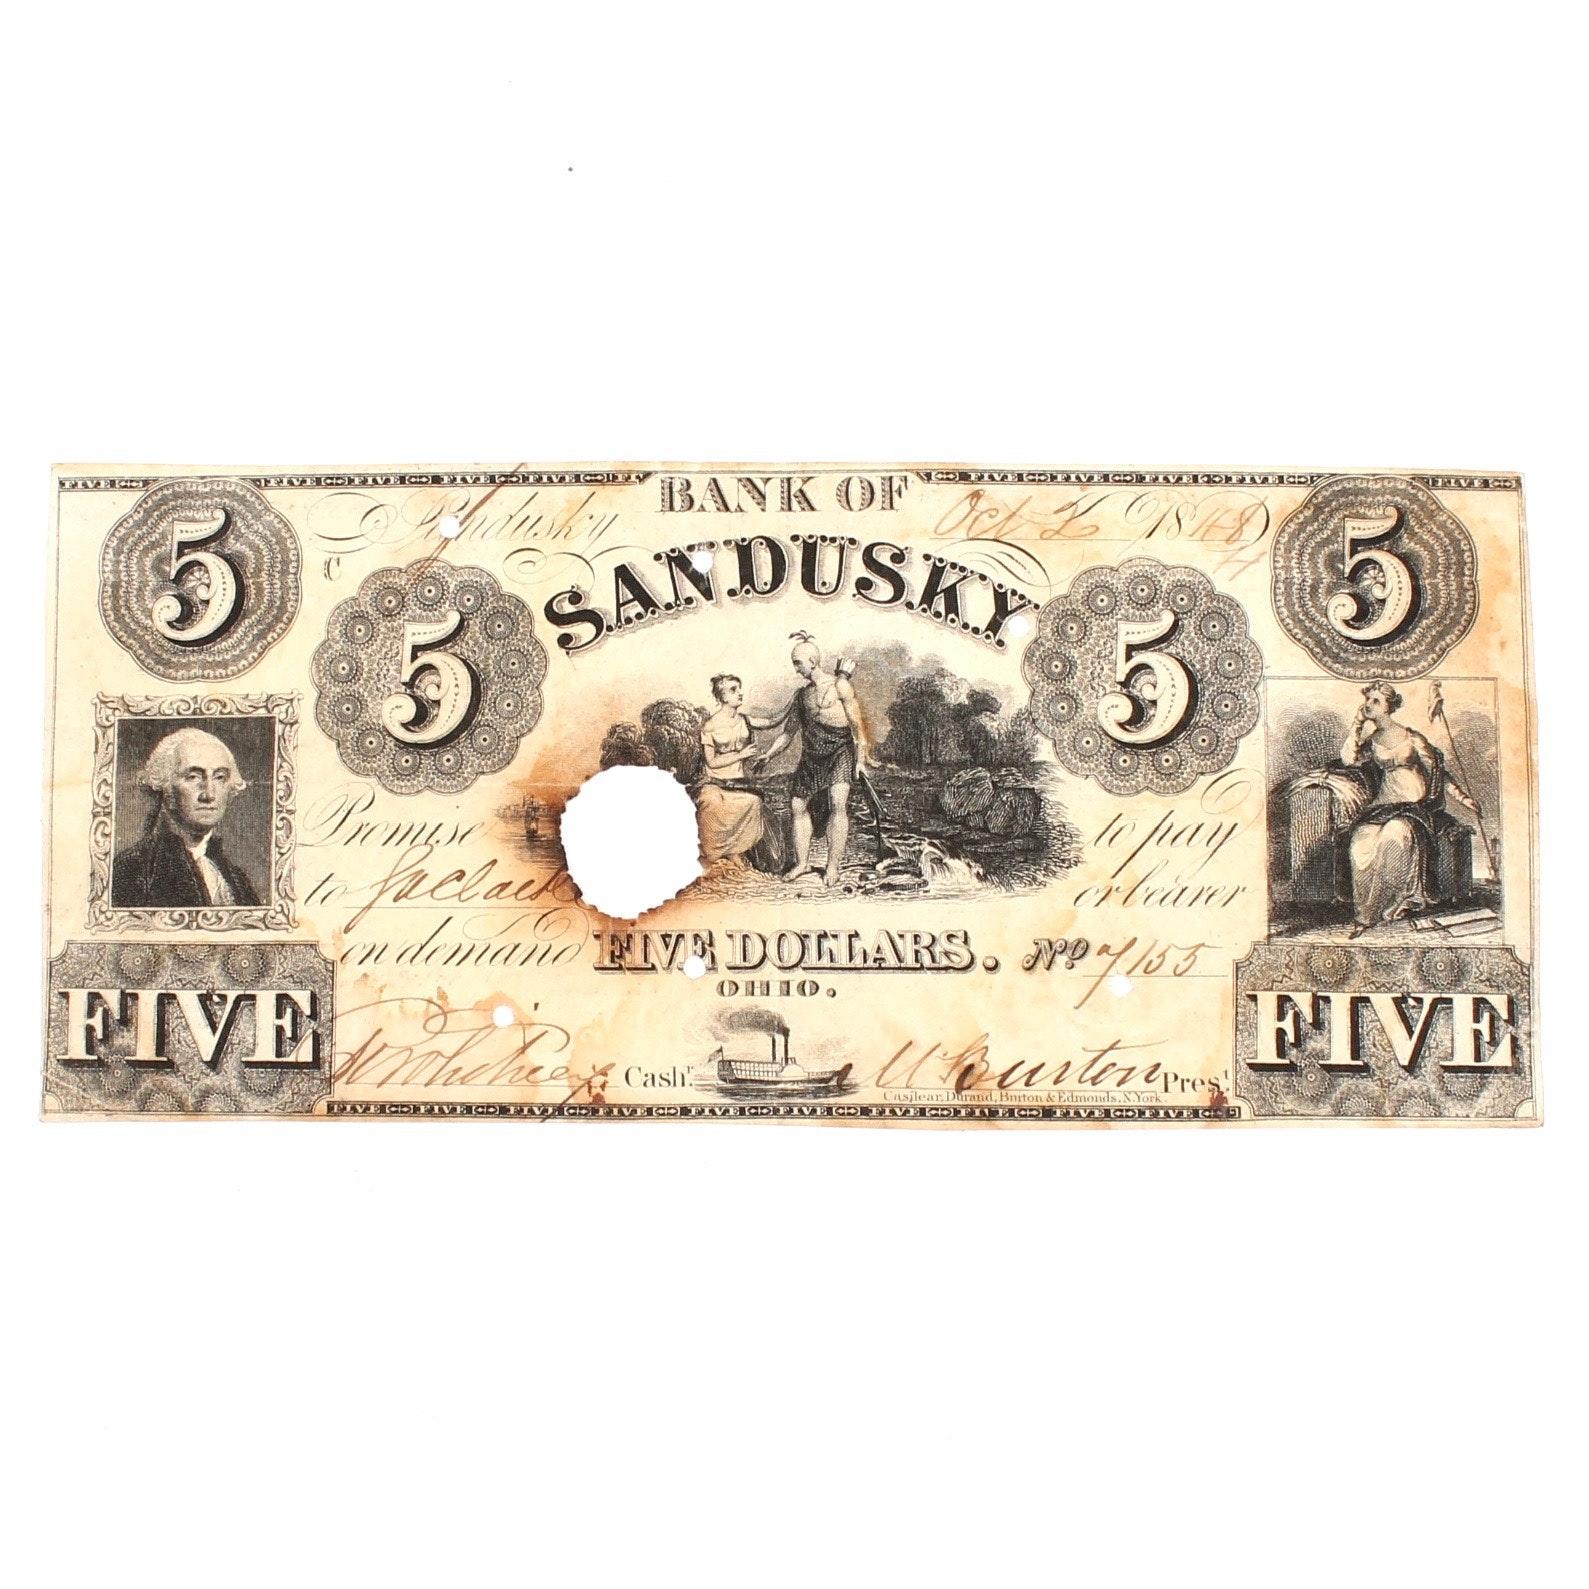 Antique Bank of Sandusky, Ohio $5 Note